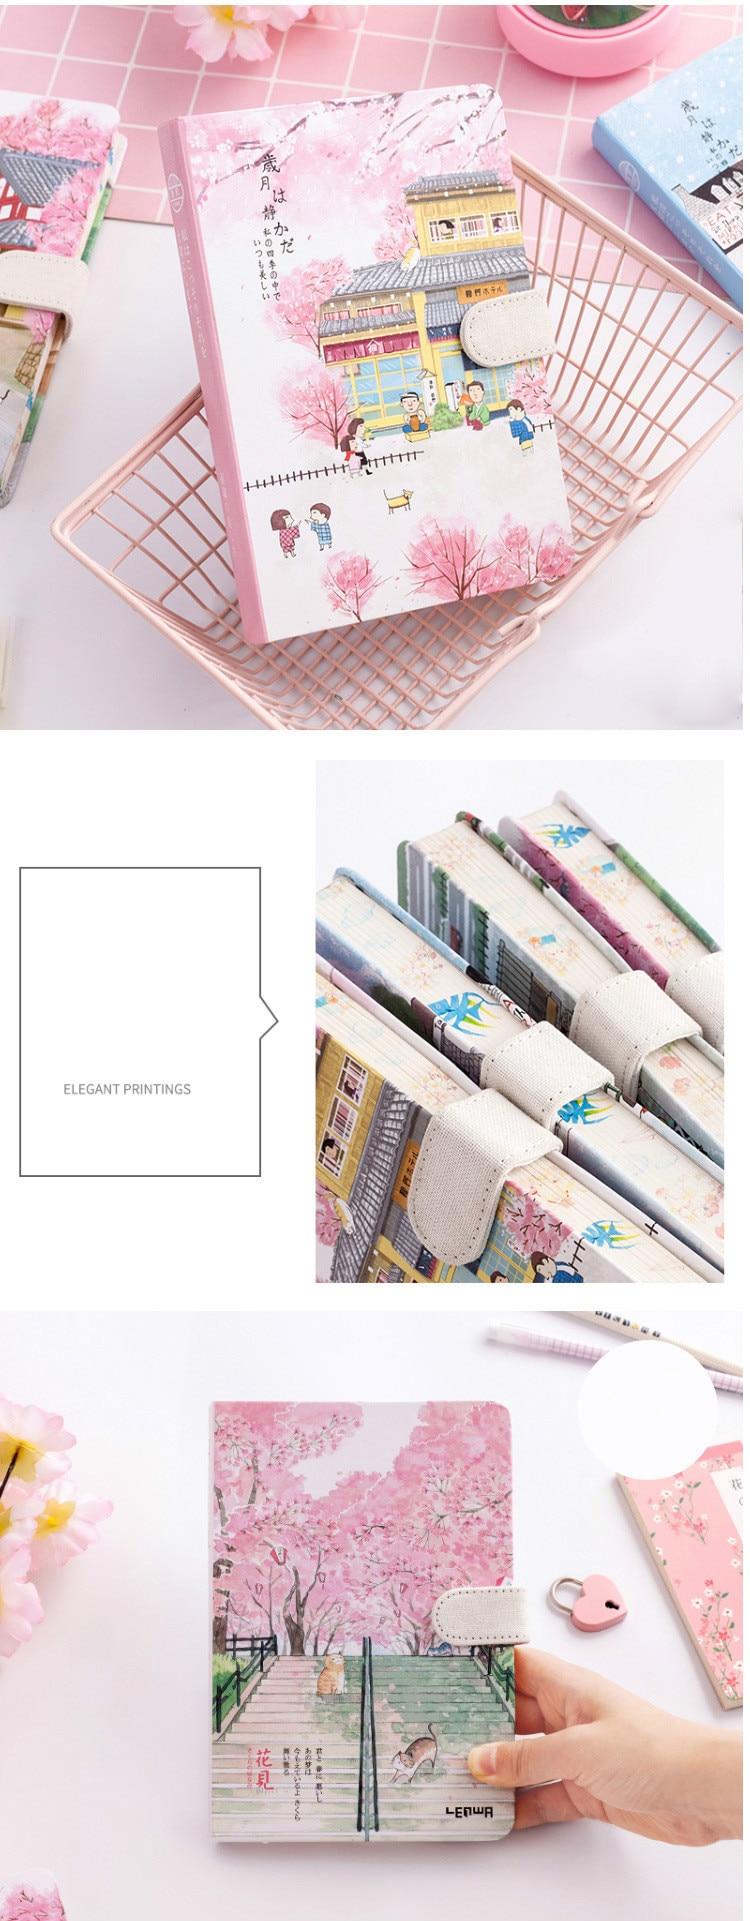 Hot Promo B35a A5 Japanese Creative Sakura Stationery Gift For